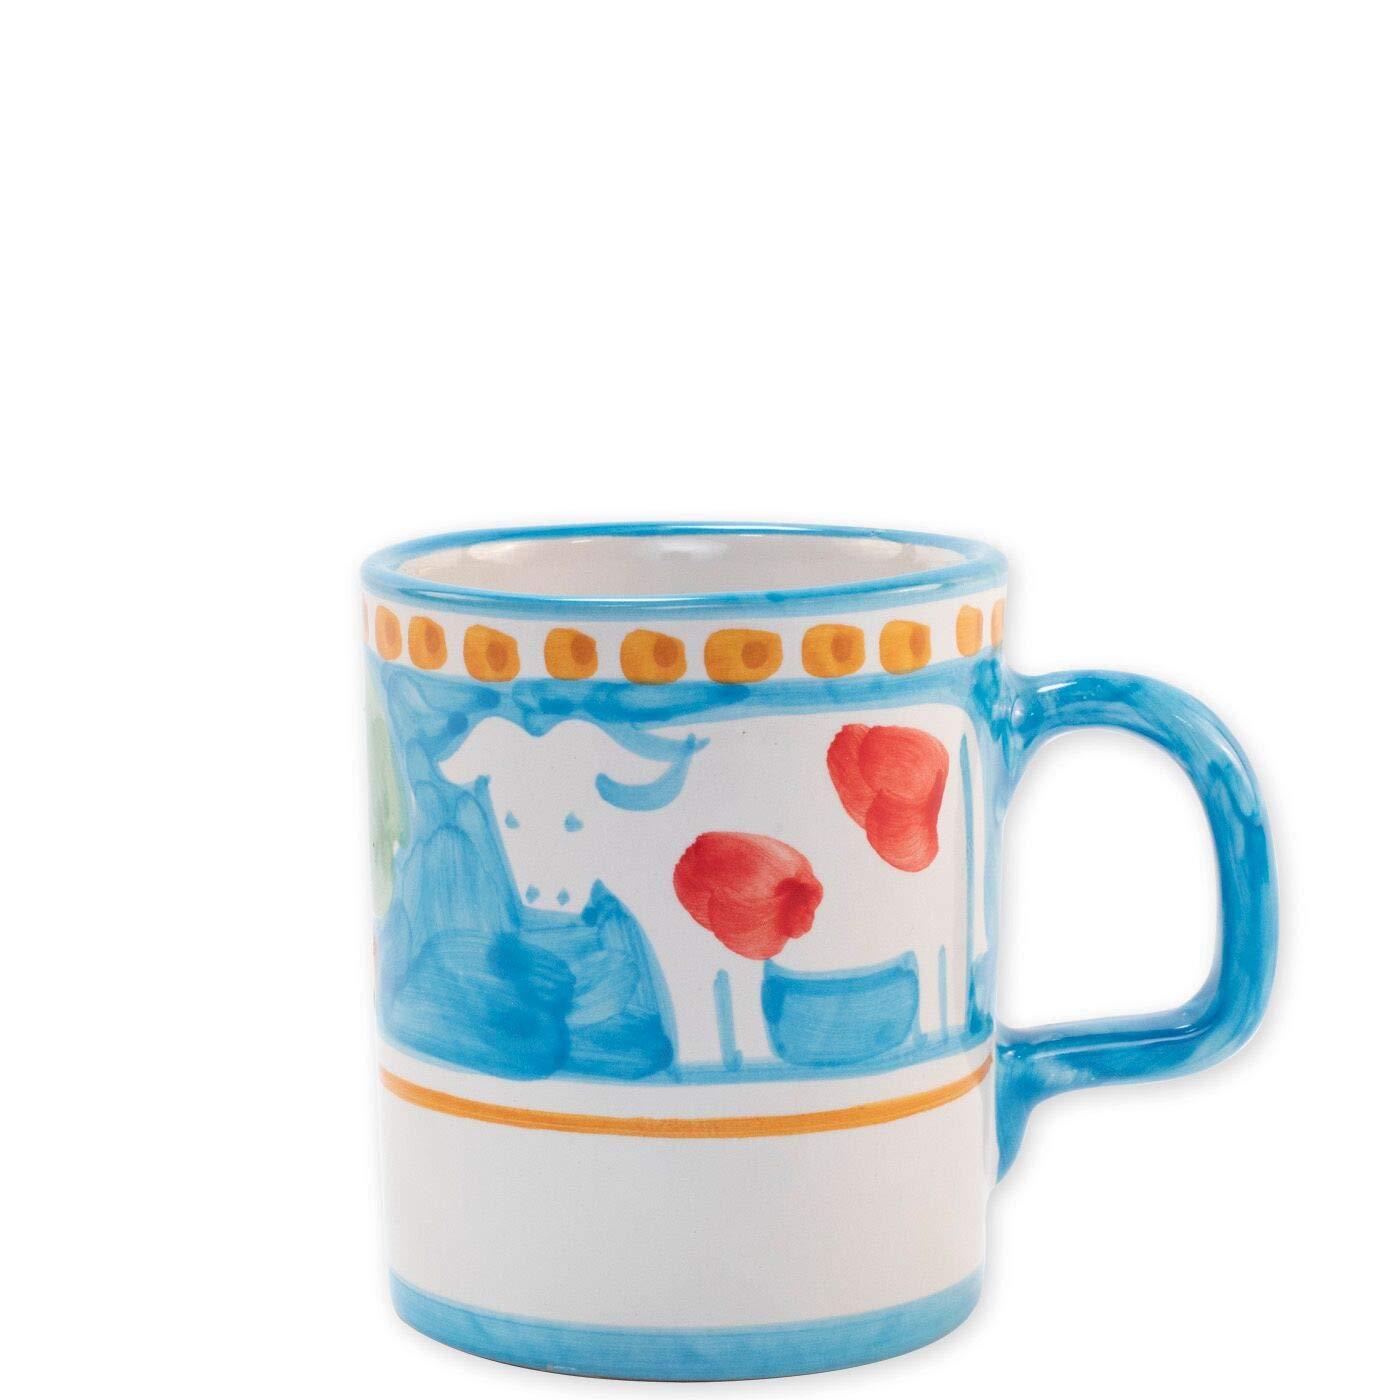 Diner Mugs 195000010Aunt Mug Turquoise